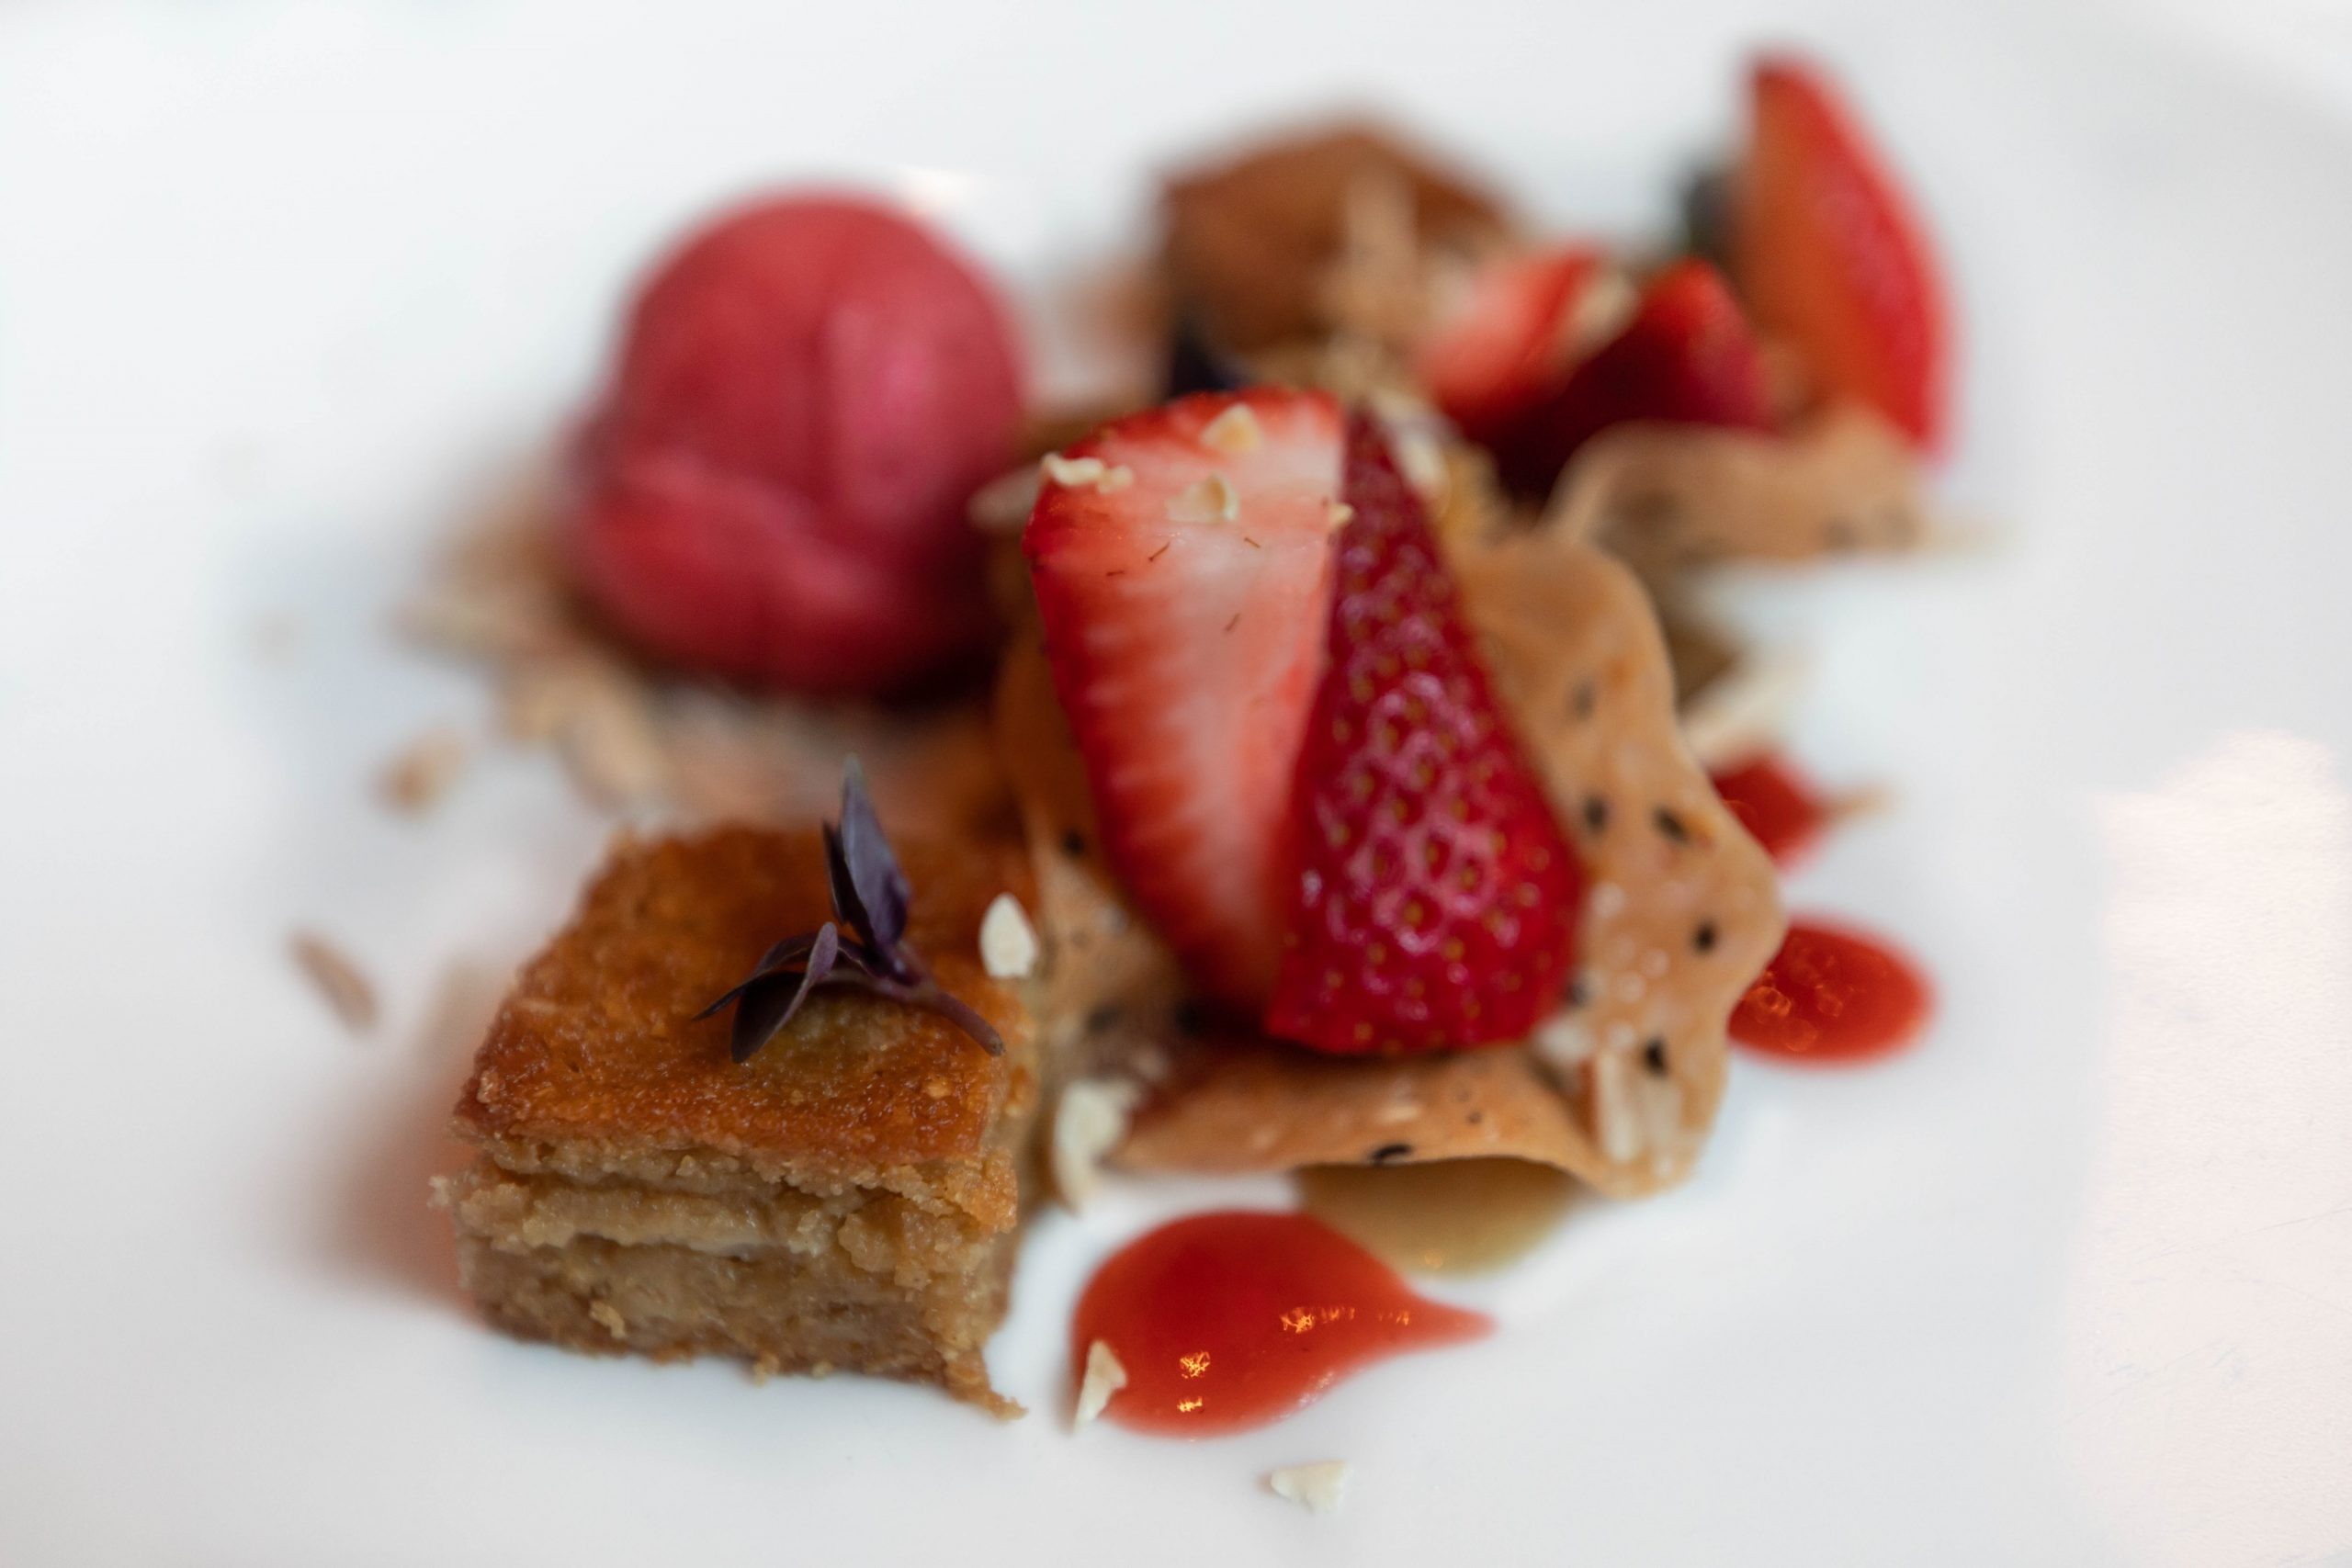 Berry Dessert at Charleston Grill from Chef Michelle Weaver Inside Belmond Charleston Place Luxury Hotel Written & Photographed by Annie Fairfax